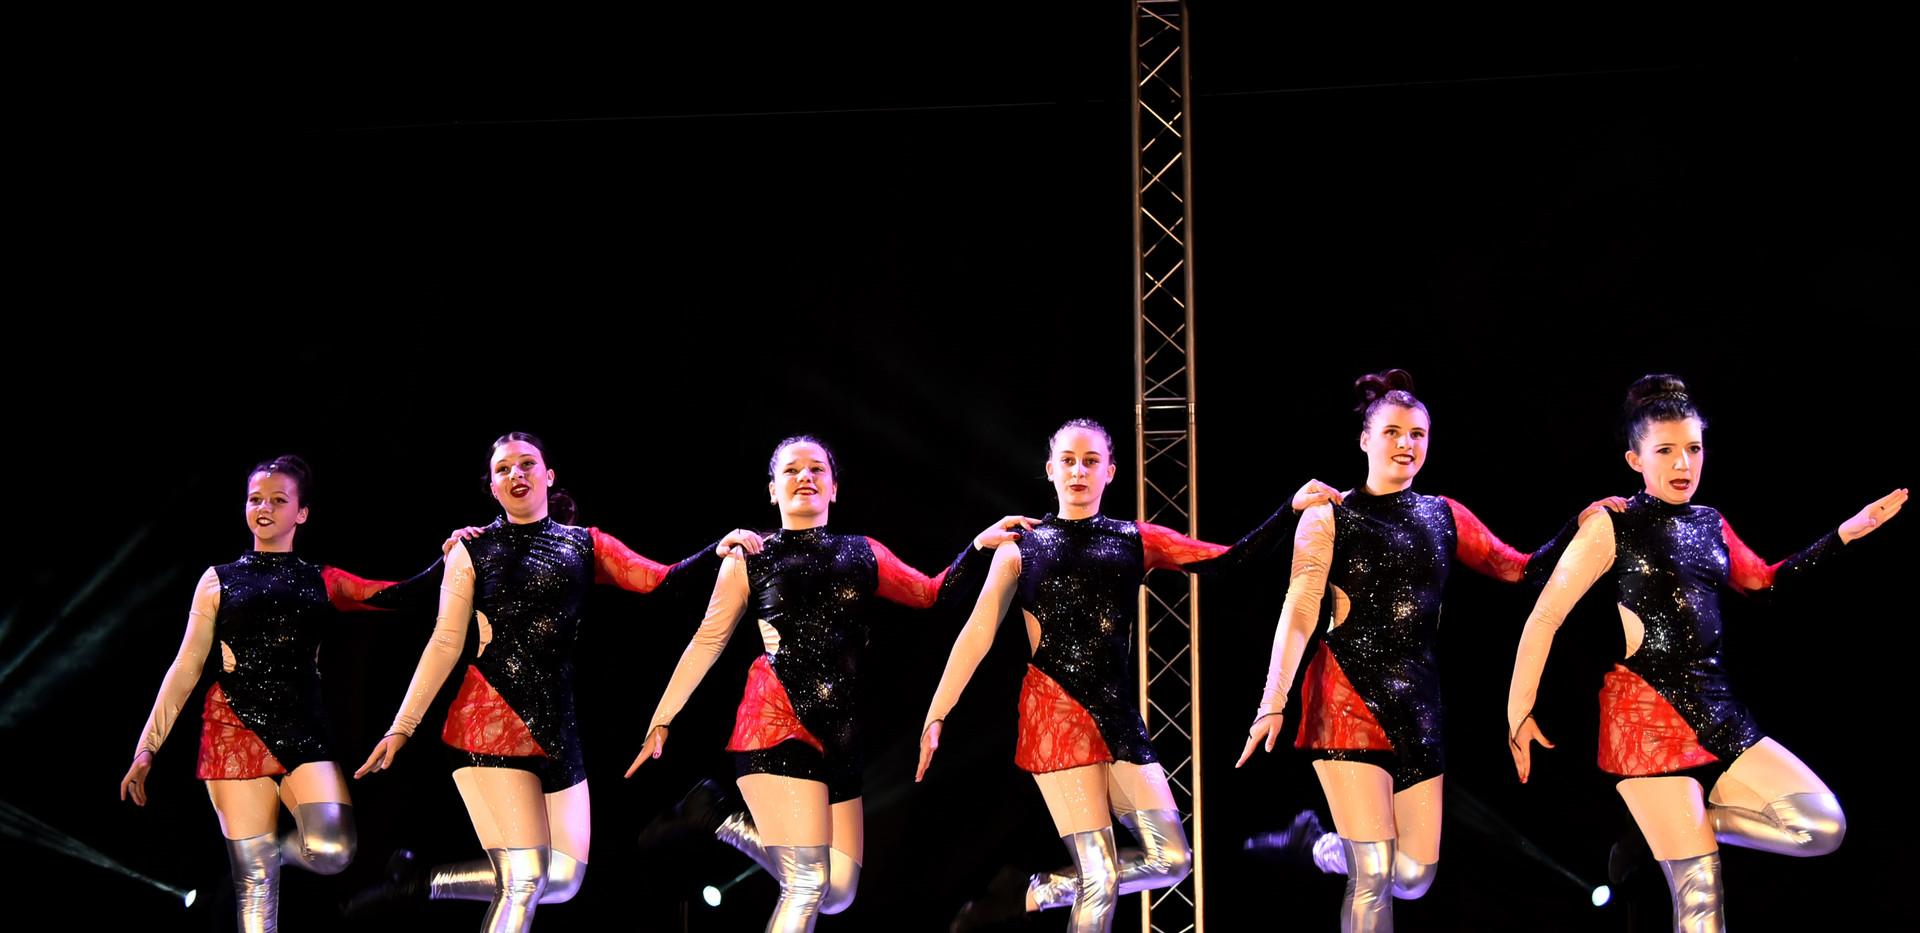 DANCE SHOW 19 - gLORINGIRLS (16)_GF.jpg